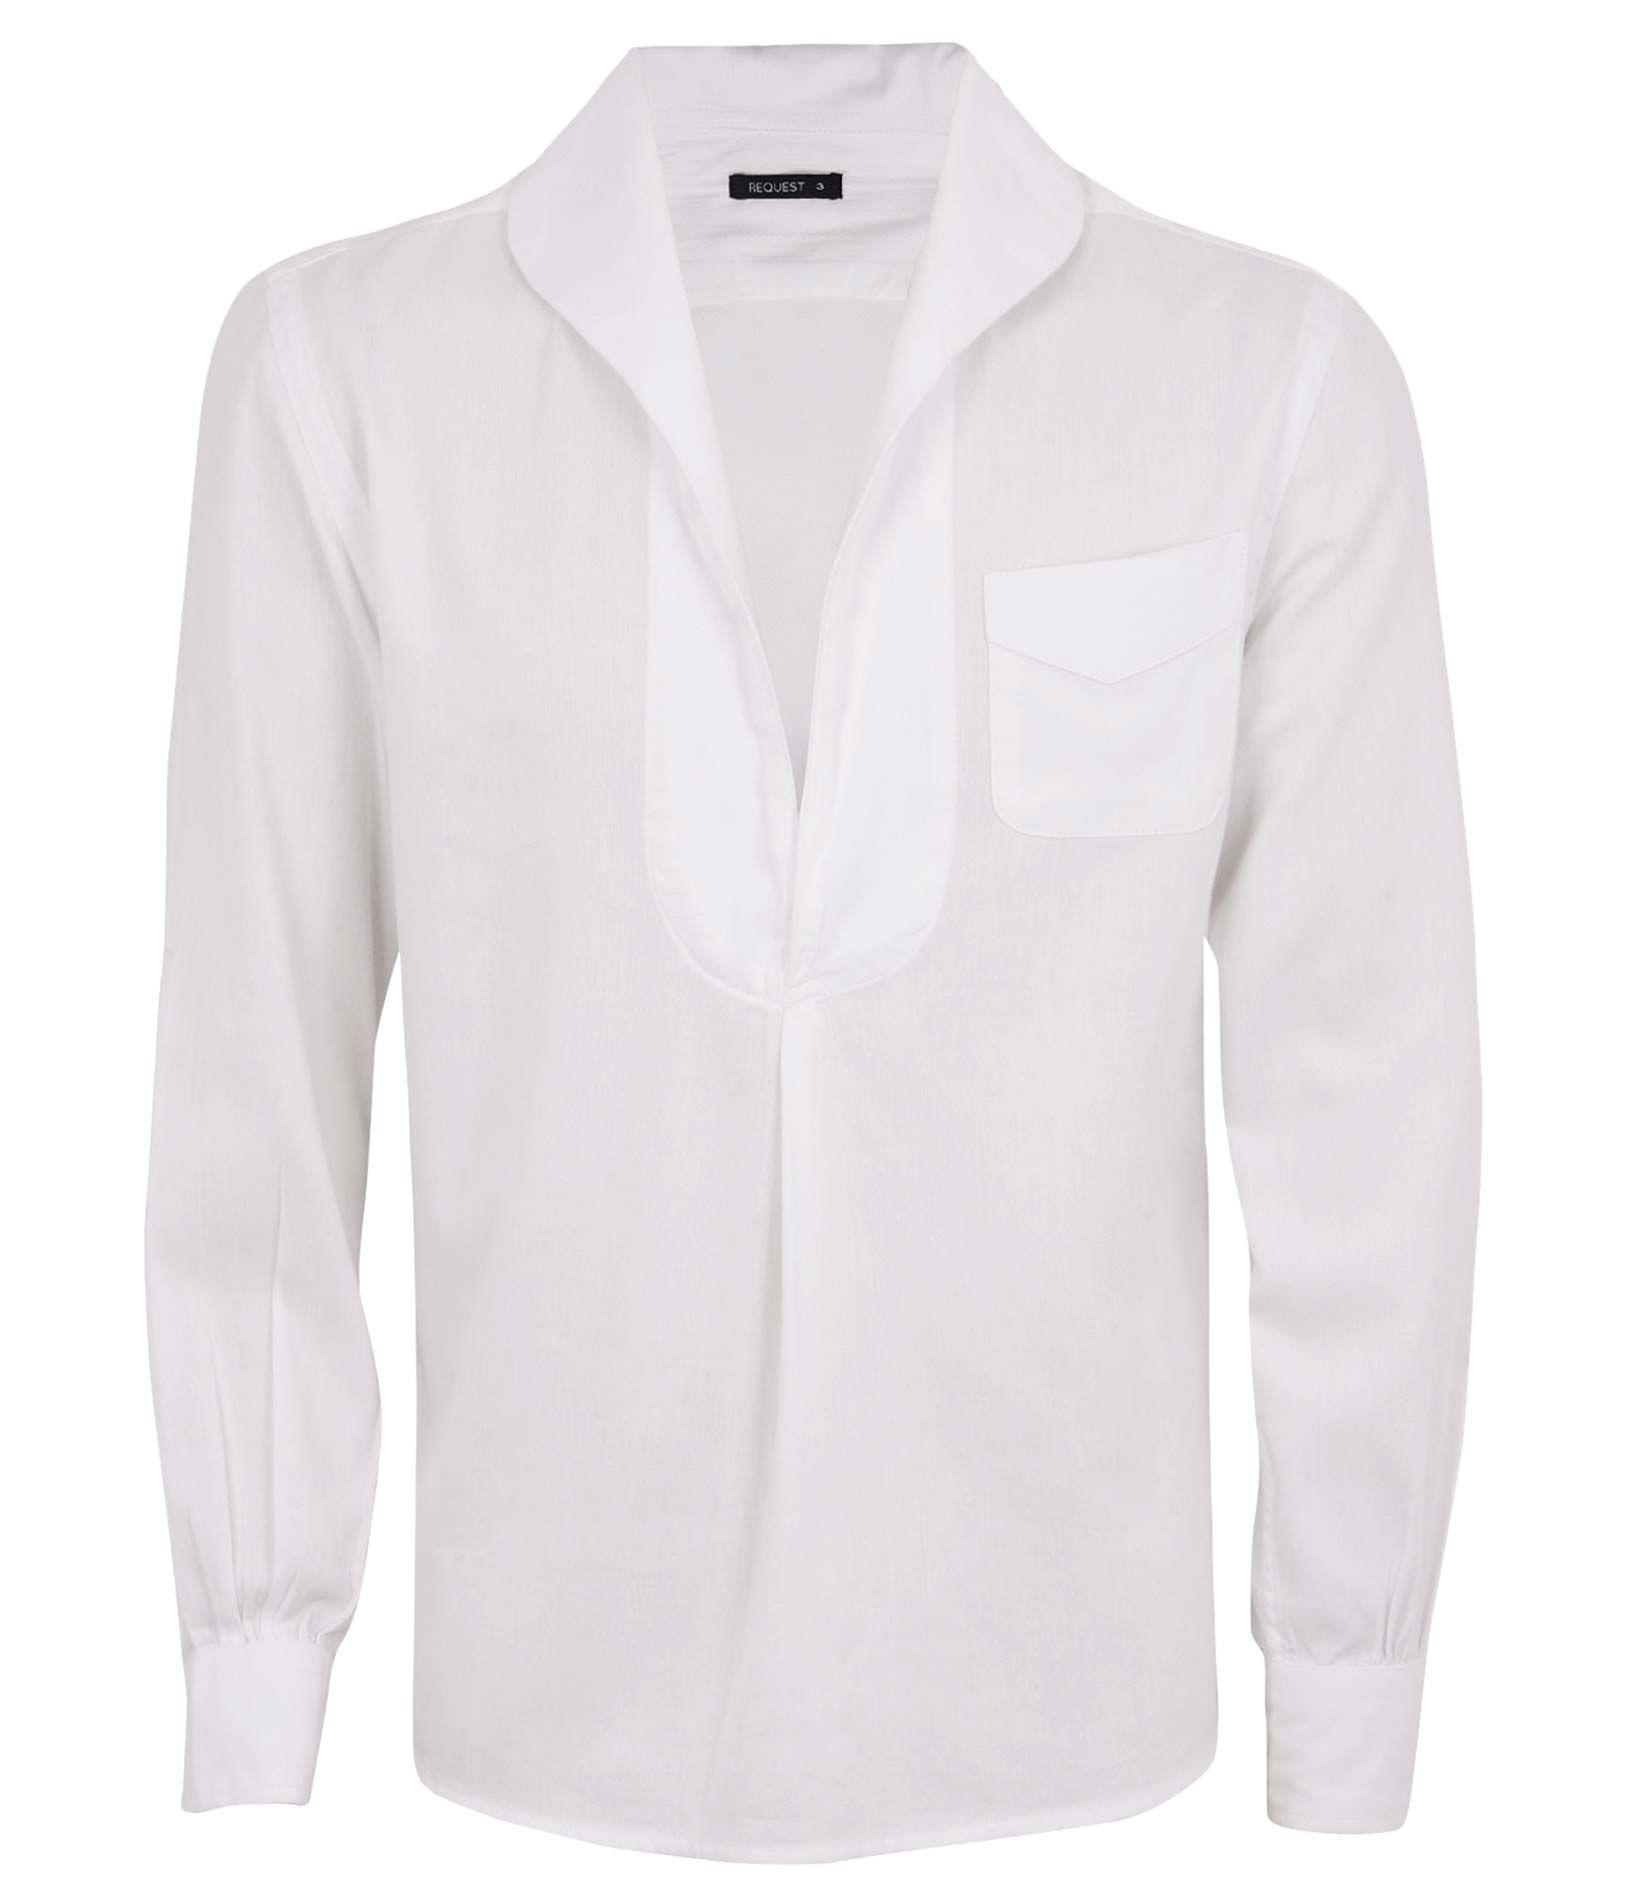 bata masculina - Pesquisa Google Roupas Modestas, Roupas Elegantes, Camisa  Social Branca, O bd19f5175f